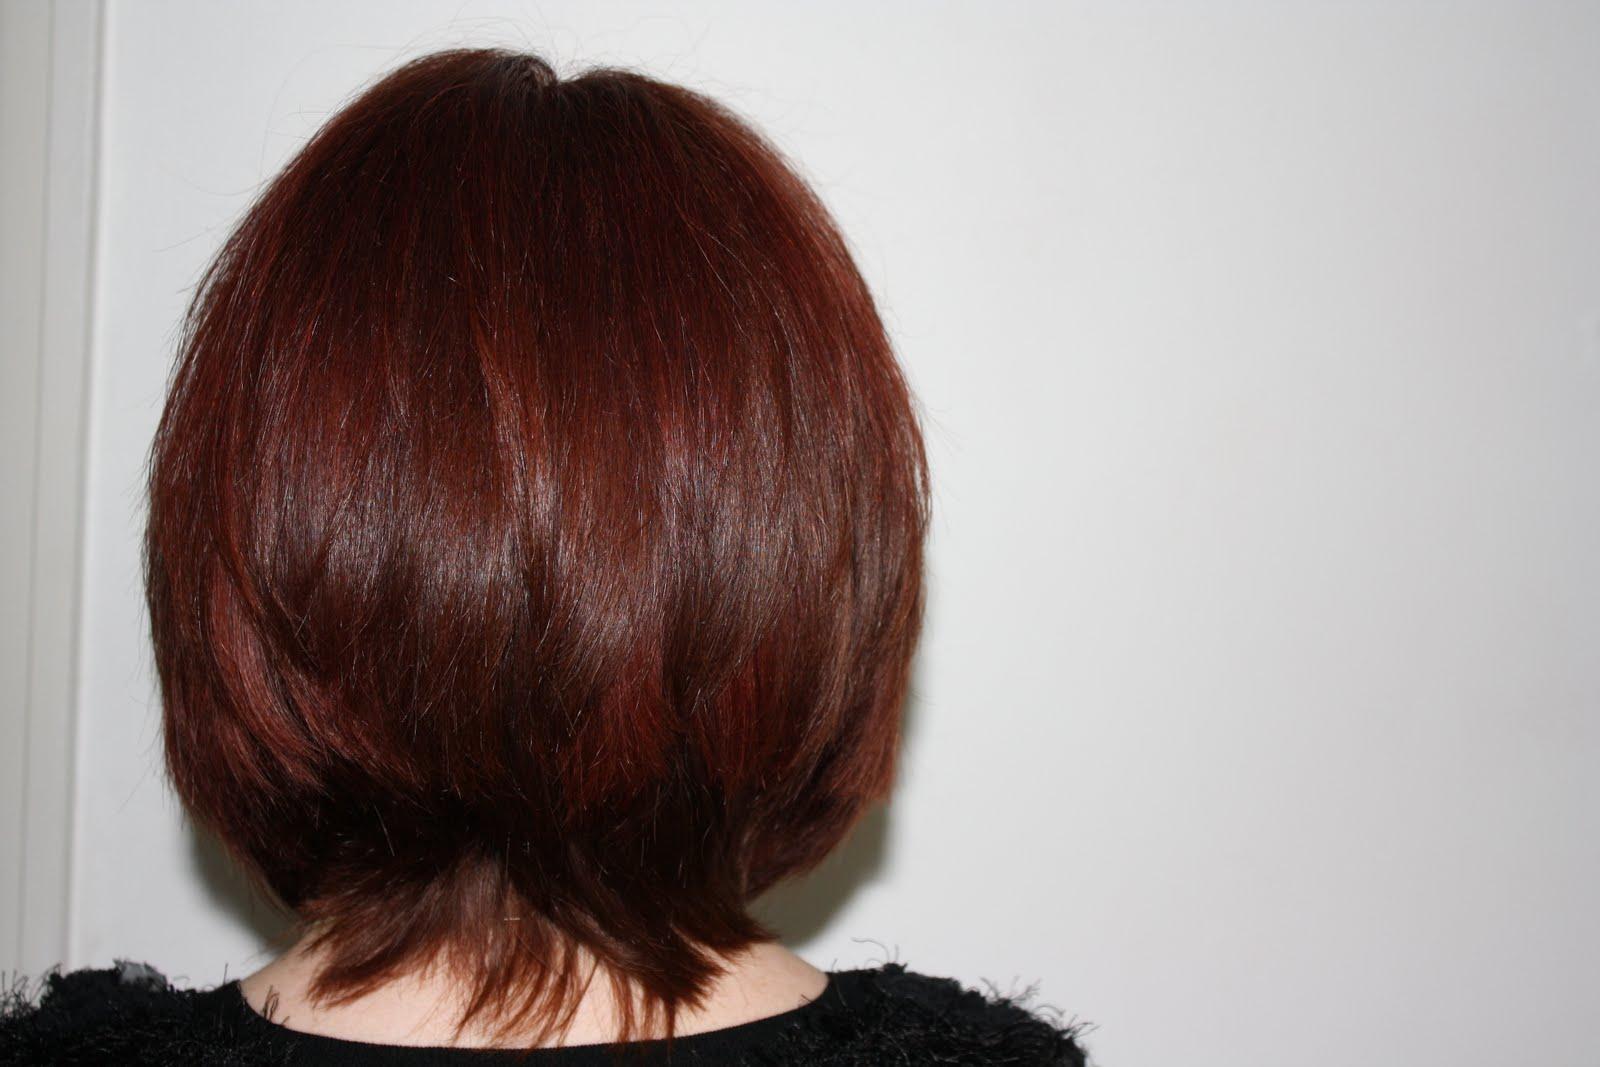 Home Based Successful Hair Salon Business